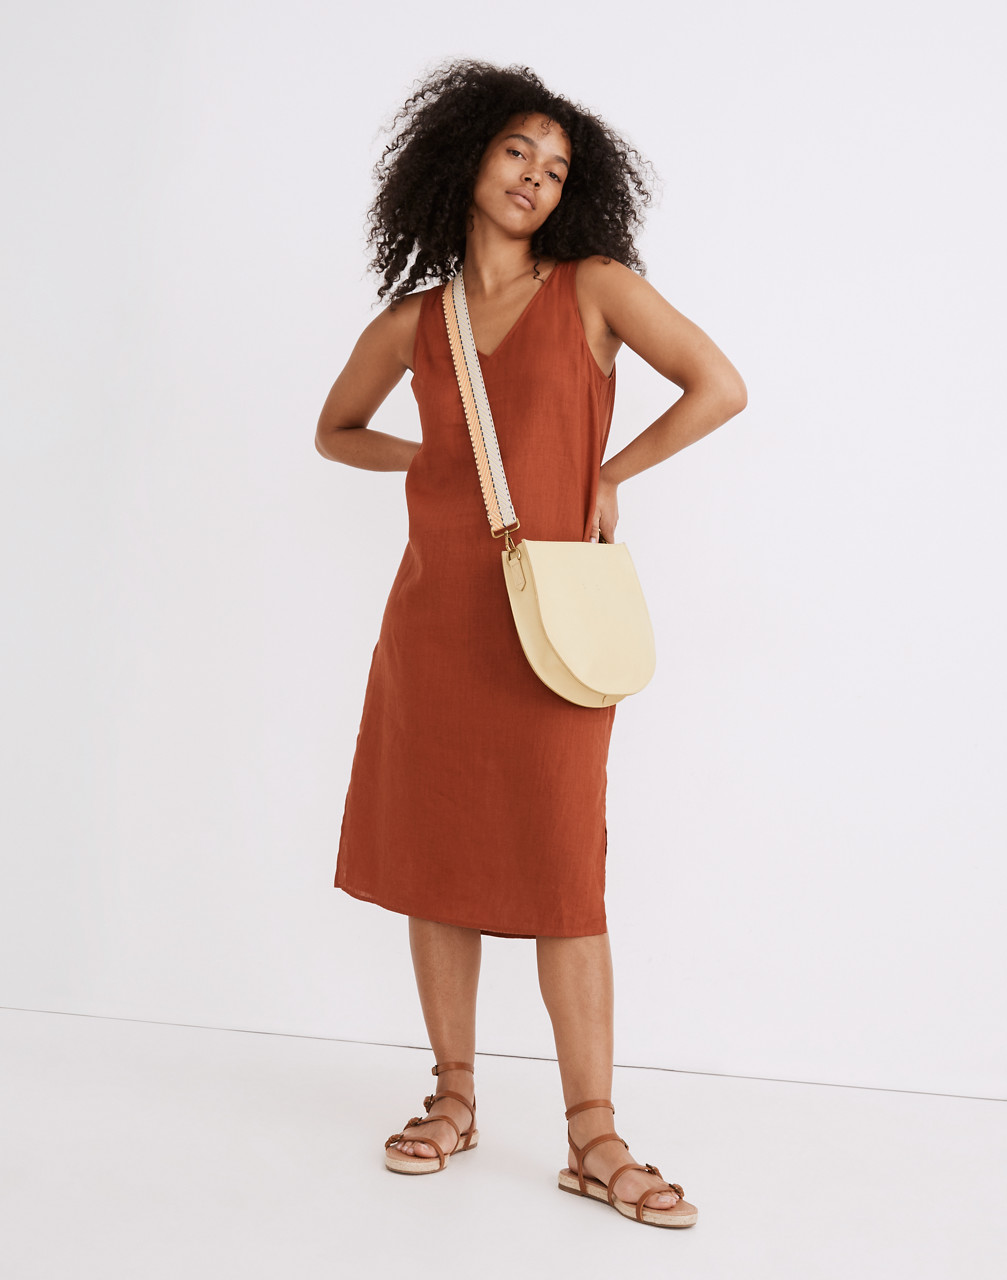 60s Dresses | 1960s Dresses Mod, Mini, Hippie Linen-Blend V-Neck Tank Dress $34.97 AT vintagedancer.com